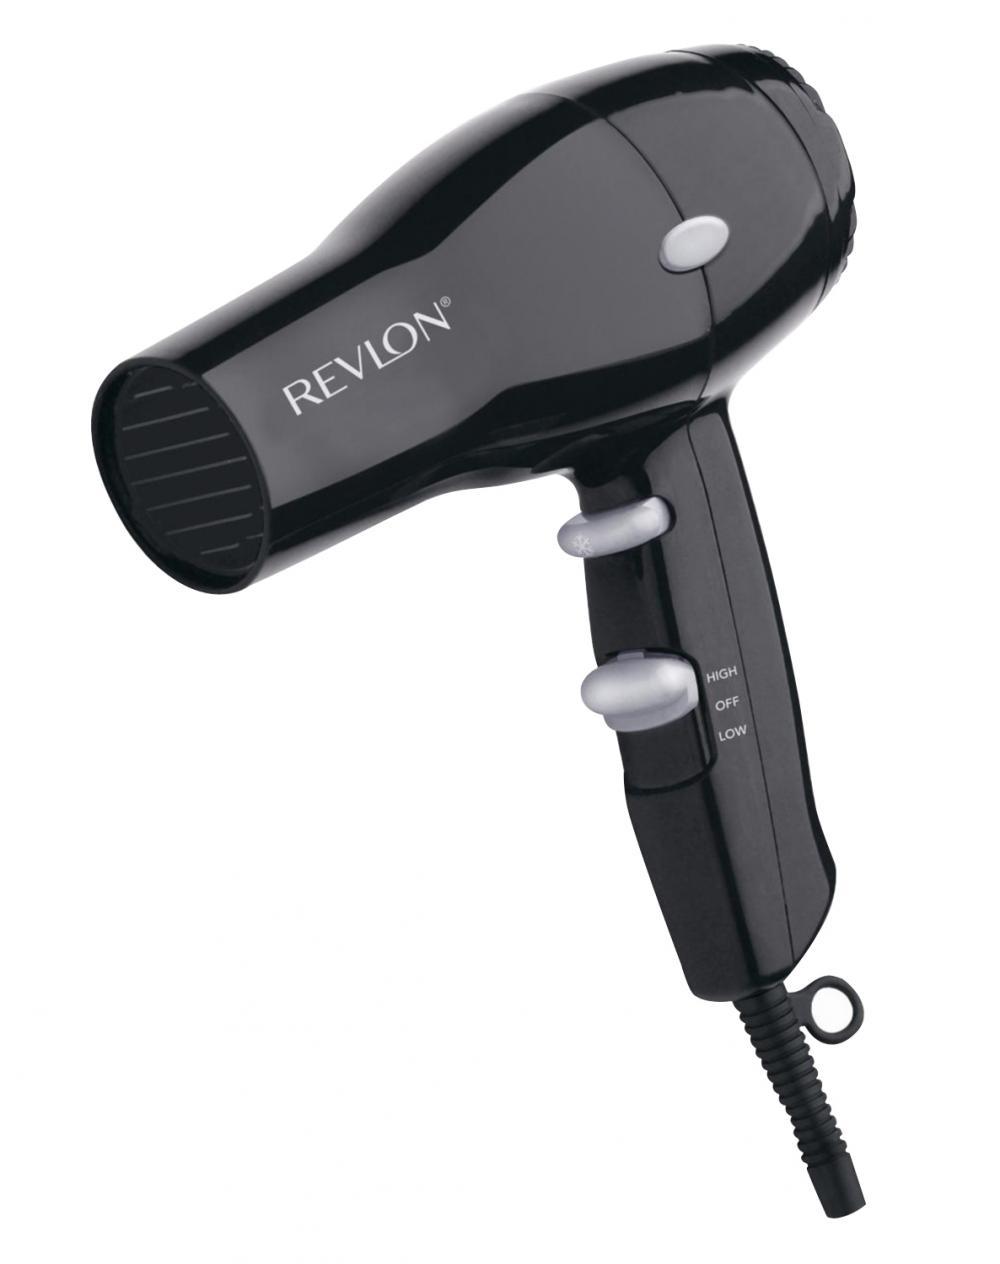 REVLON 1875-WATT 2-SPEED HAIR DRYER